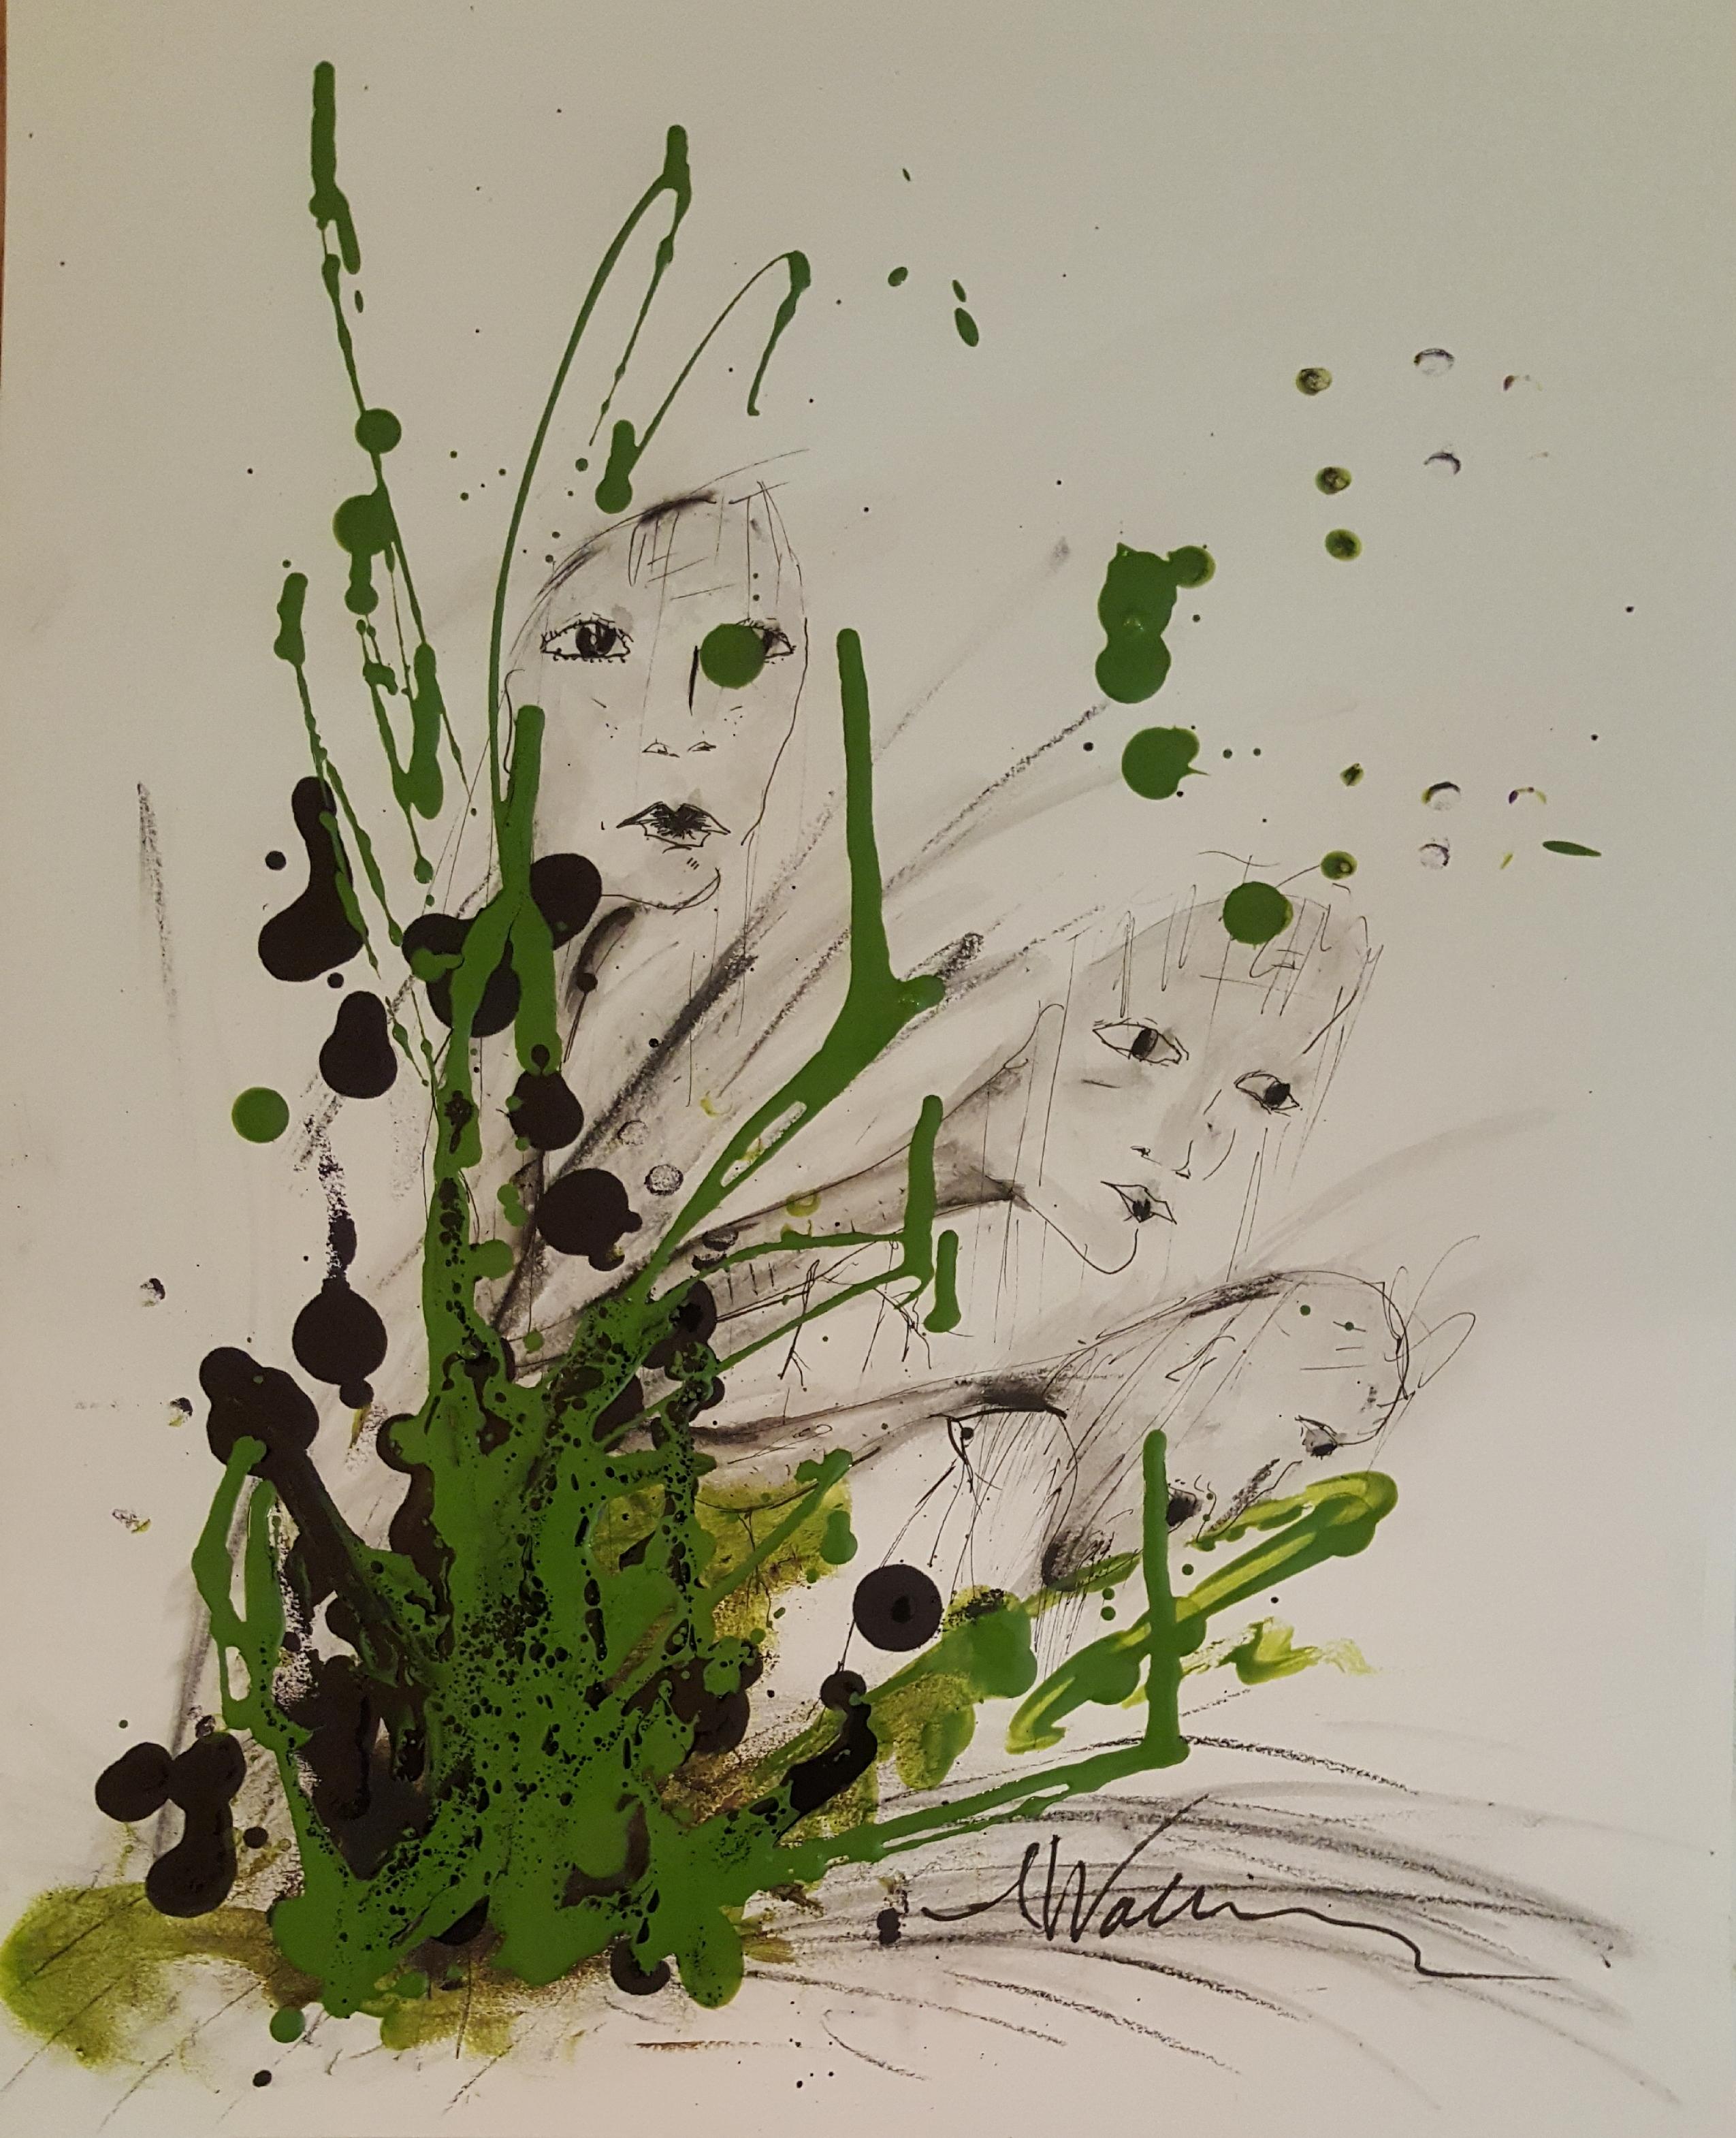 Plant Life #1